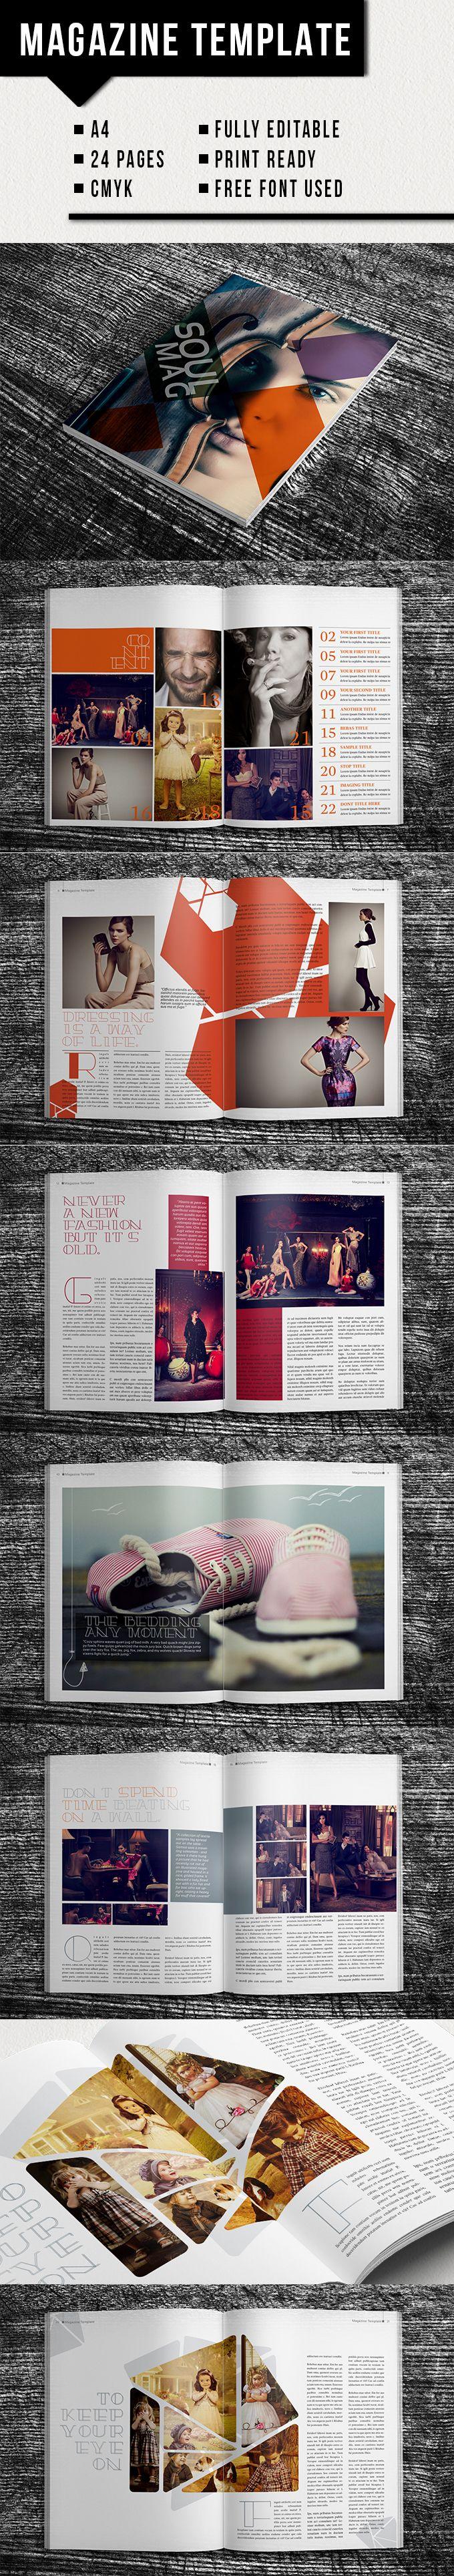 Free Fashion Magazine Layout Templates